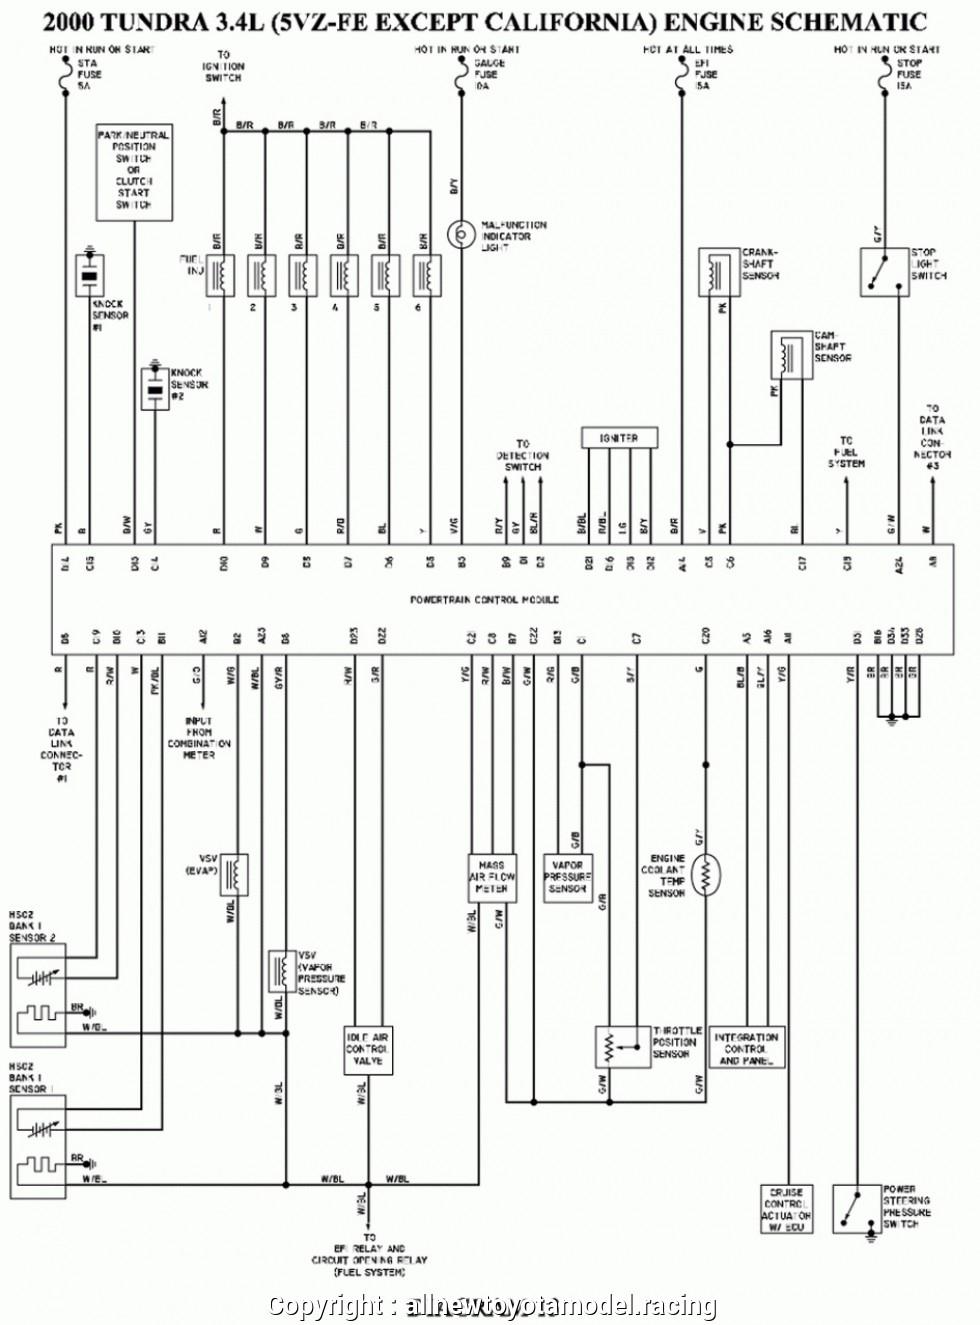 35 Wiring diagram ideas in 2021 | diagram, wire, electrical wiring diagramPinterest